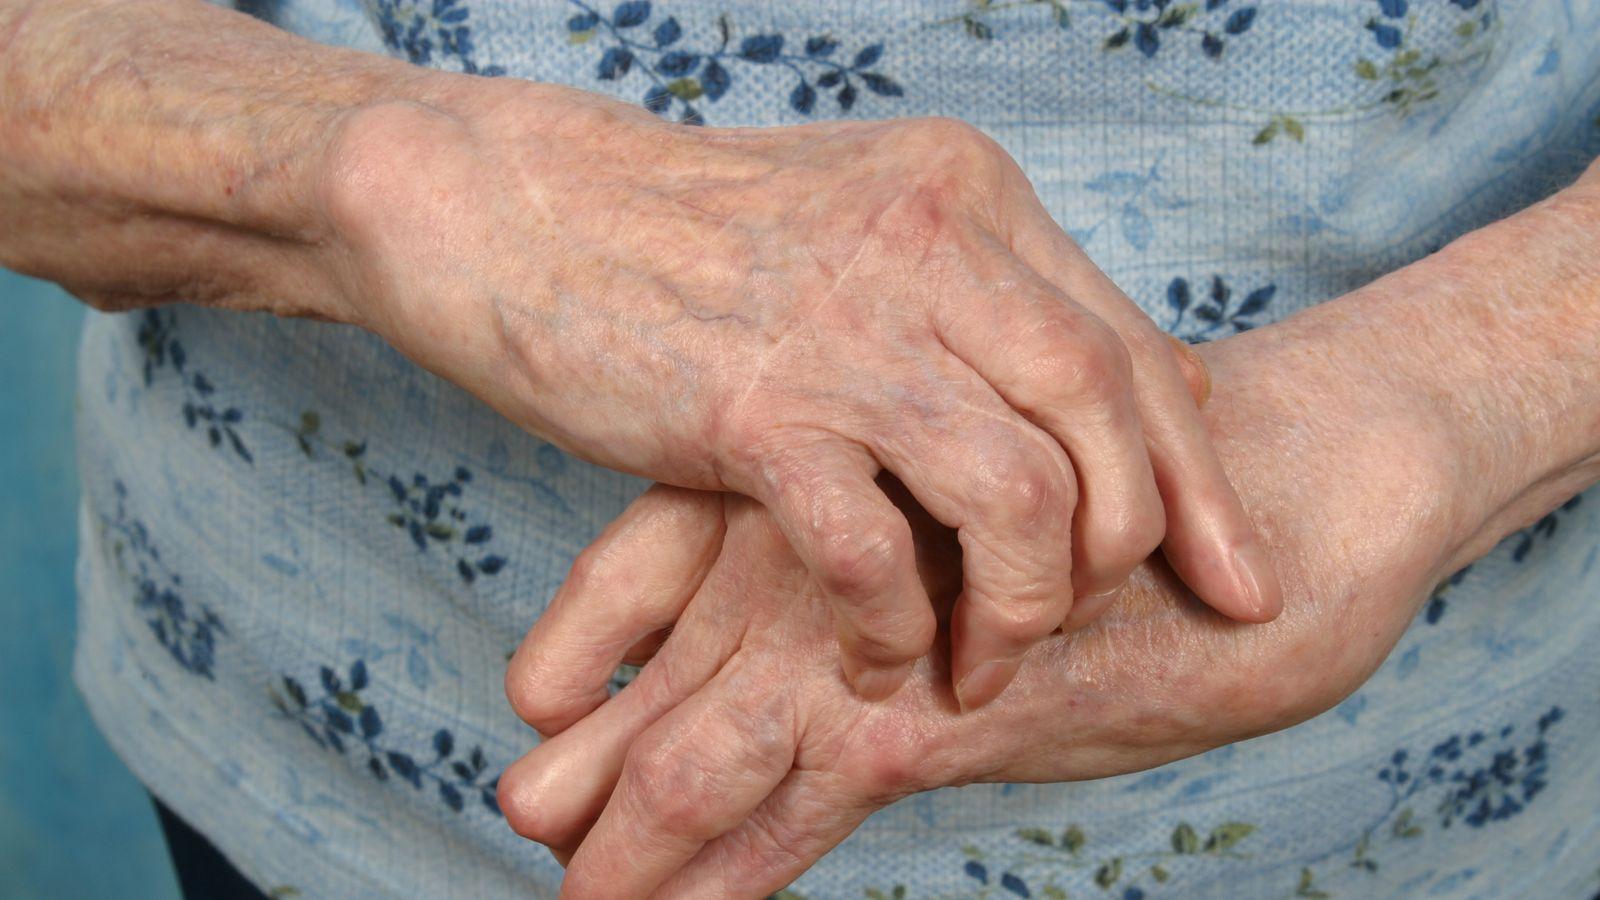 Arthritis sufferers 'struggling in silence'